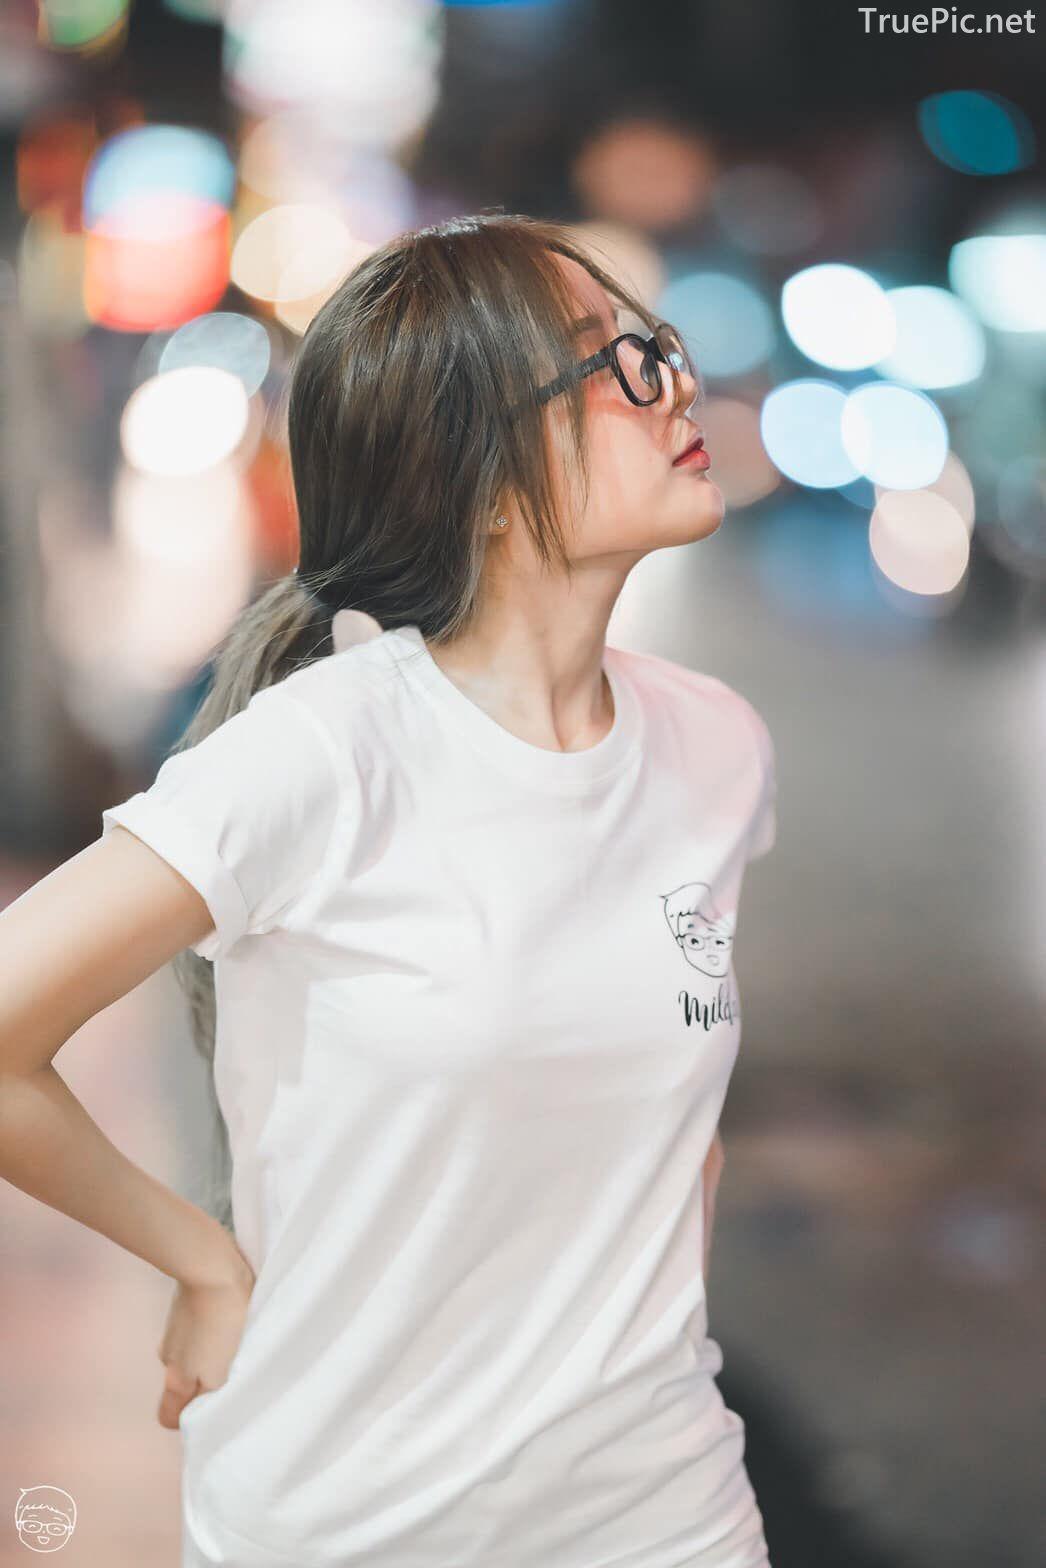 Thailand Hot Girl - Thanyarat Charoenpornkittada - Bustling City Tours - TruePic.net - Picture 7